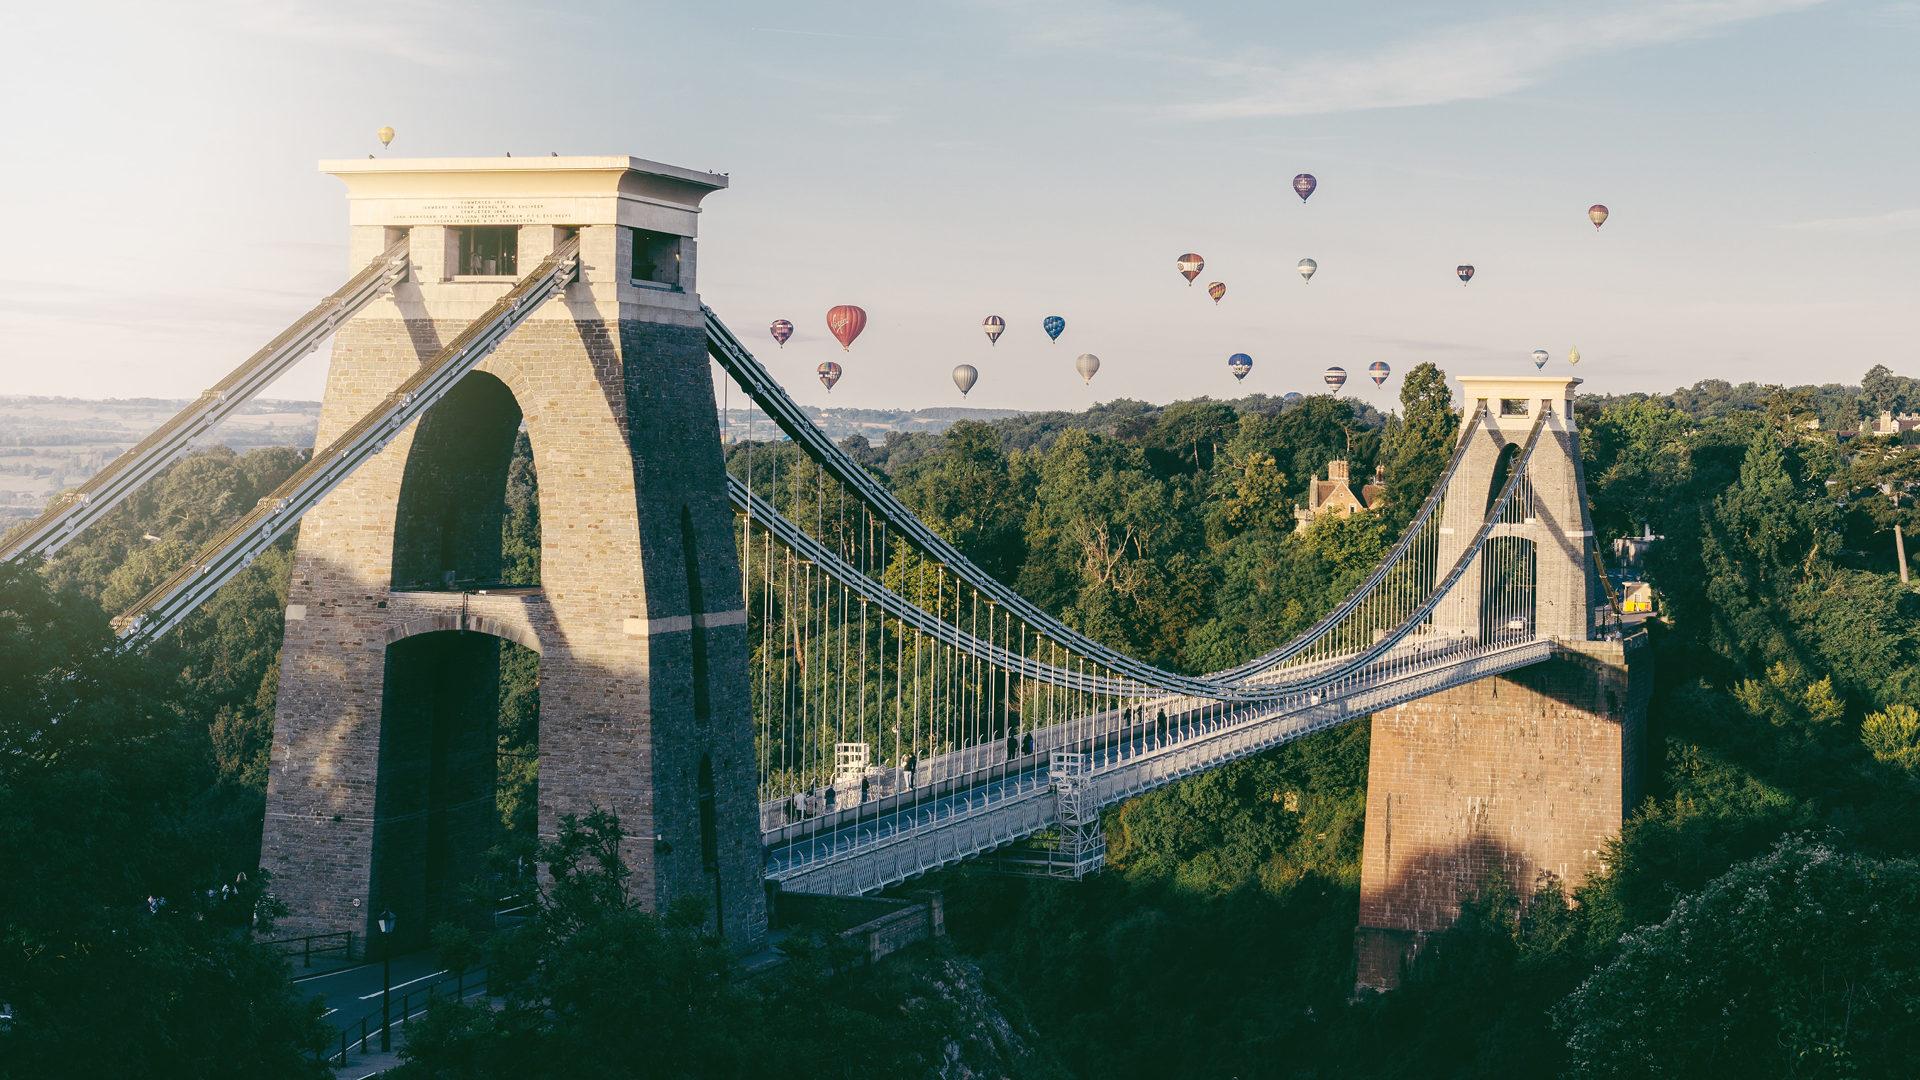 Bristol Suspension Bridge with balloons